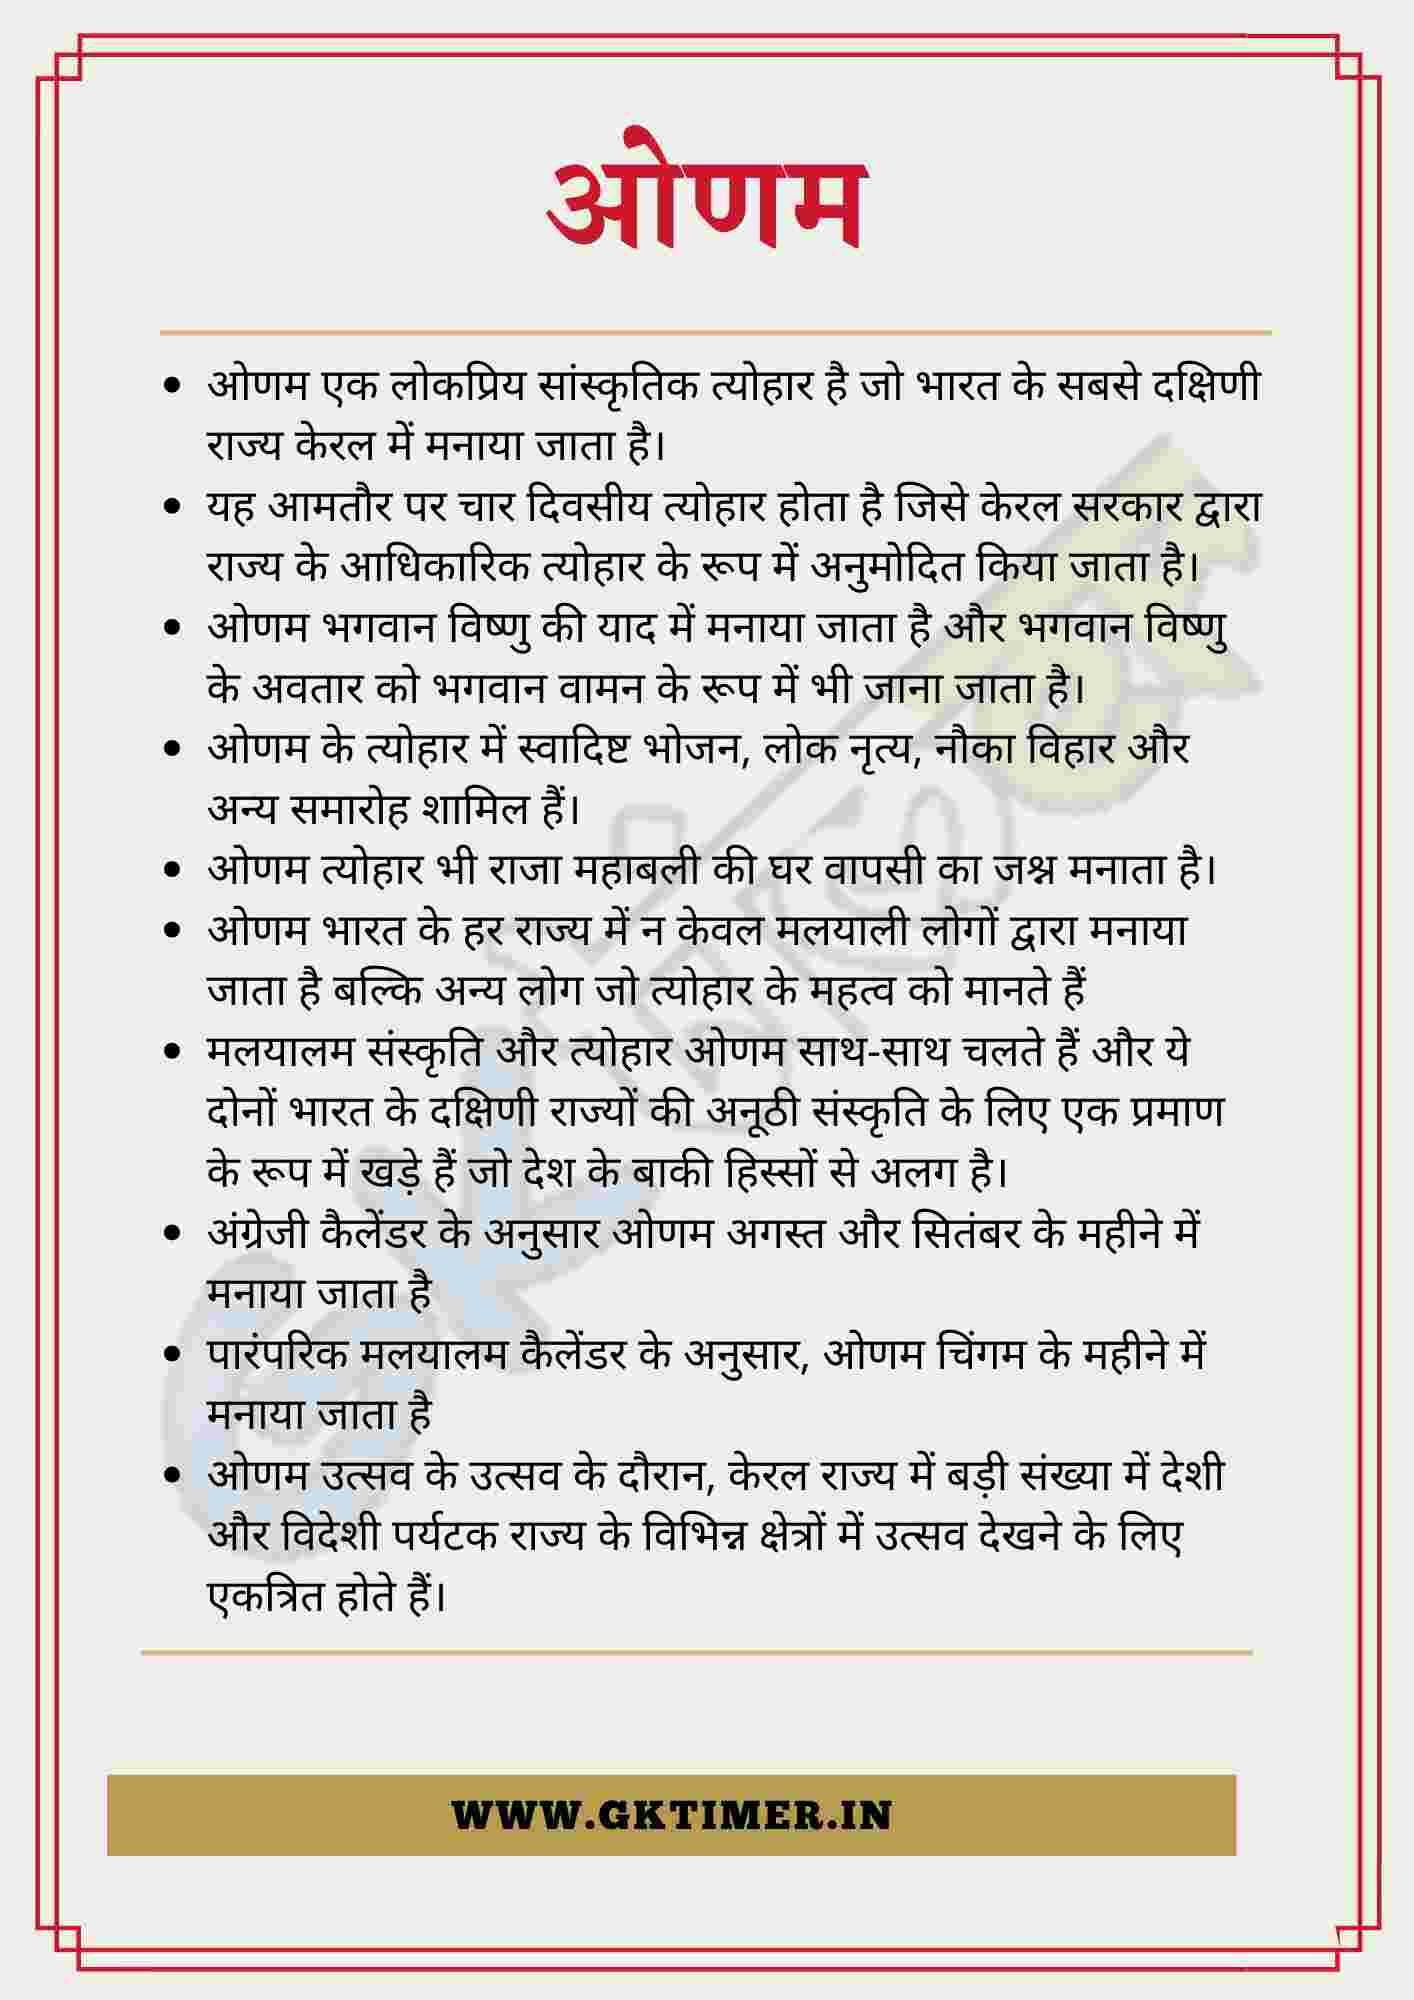 ओणम पर निबंध | Onam Essay in Hindi | 10 Lines on Onam in Hindi